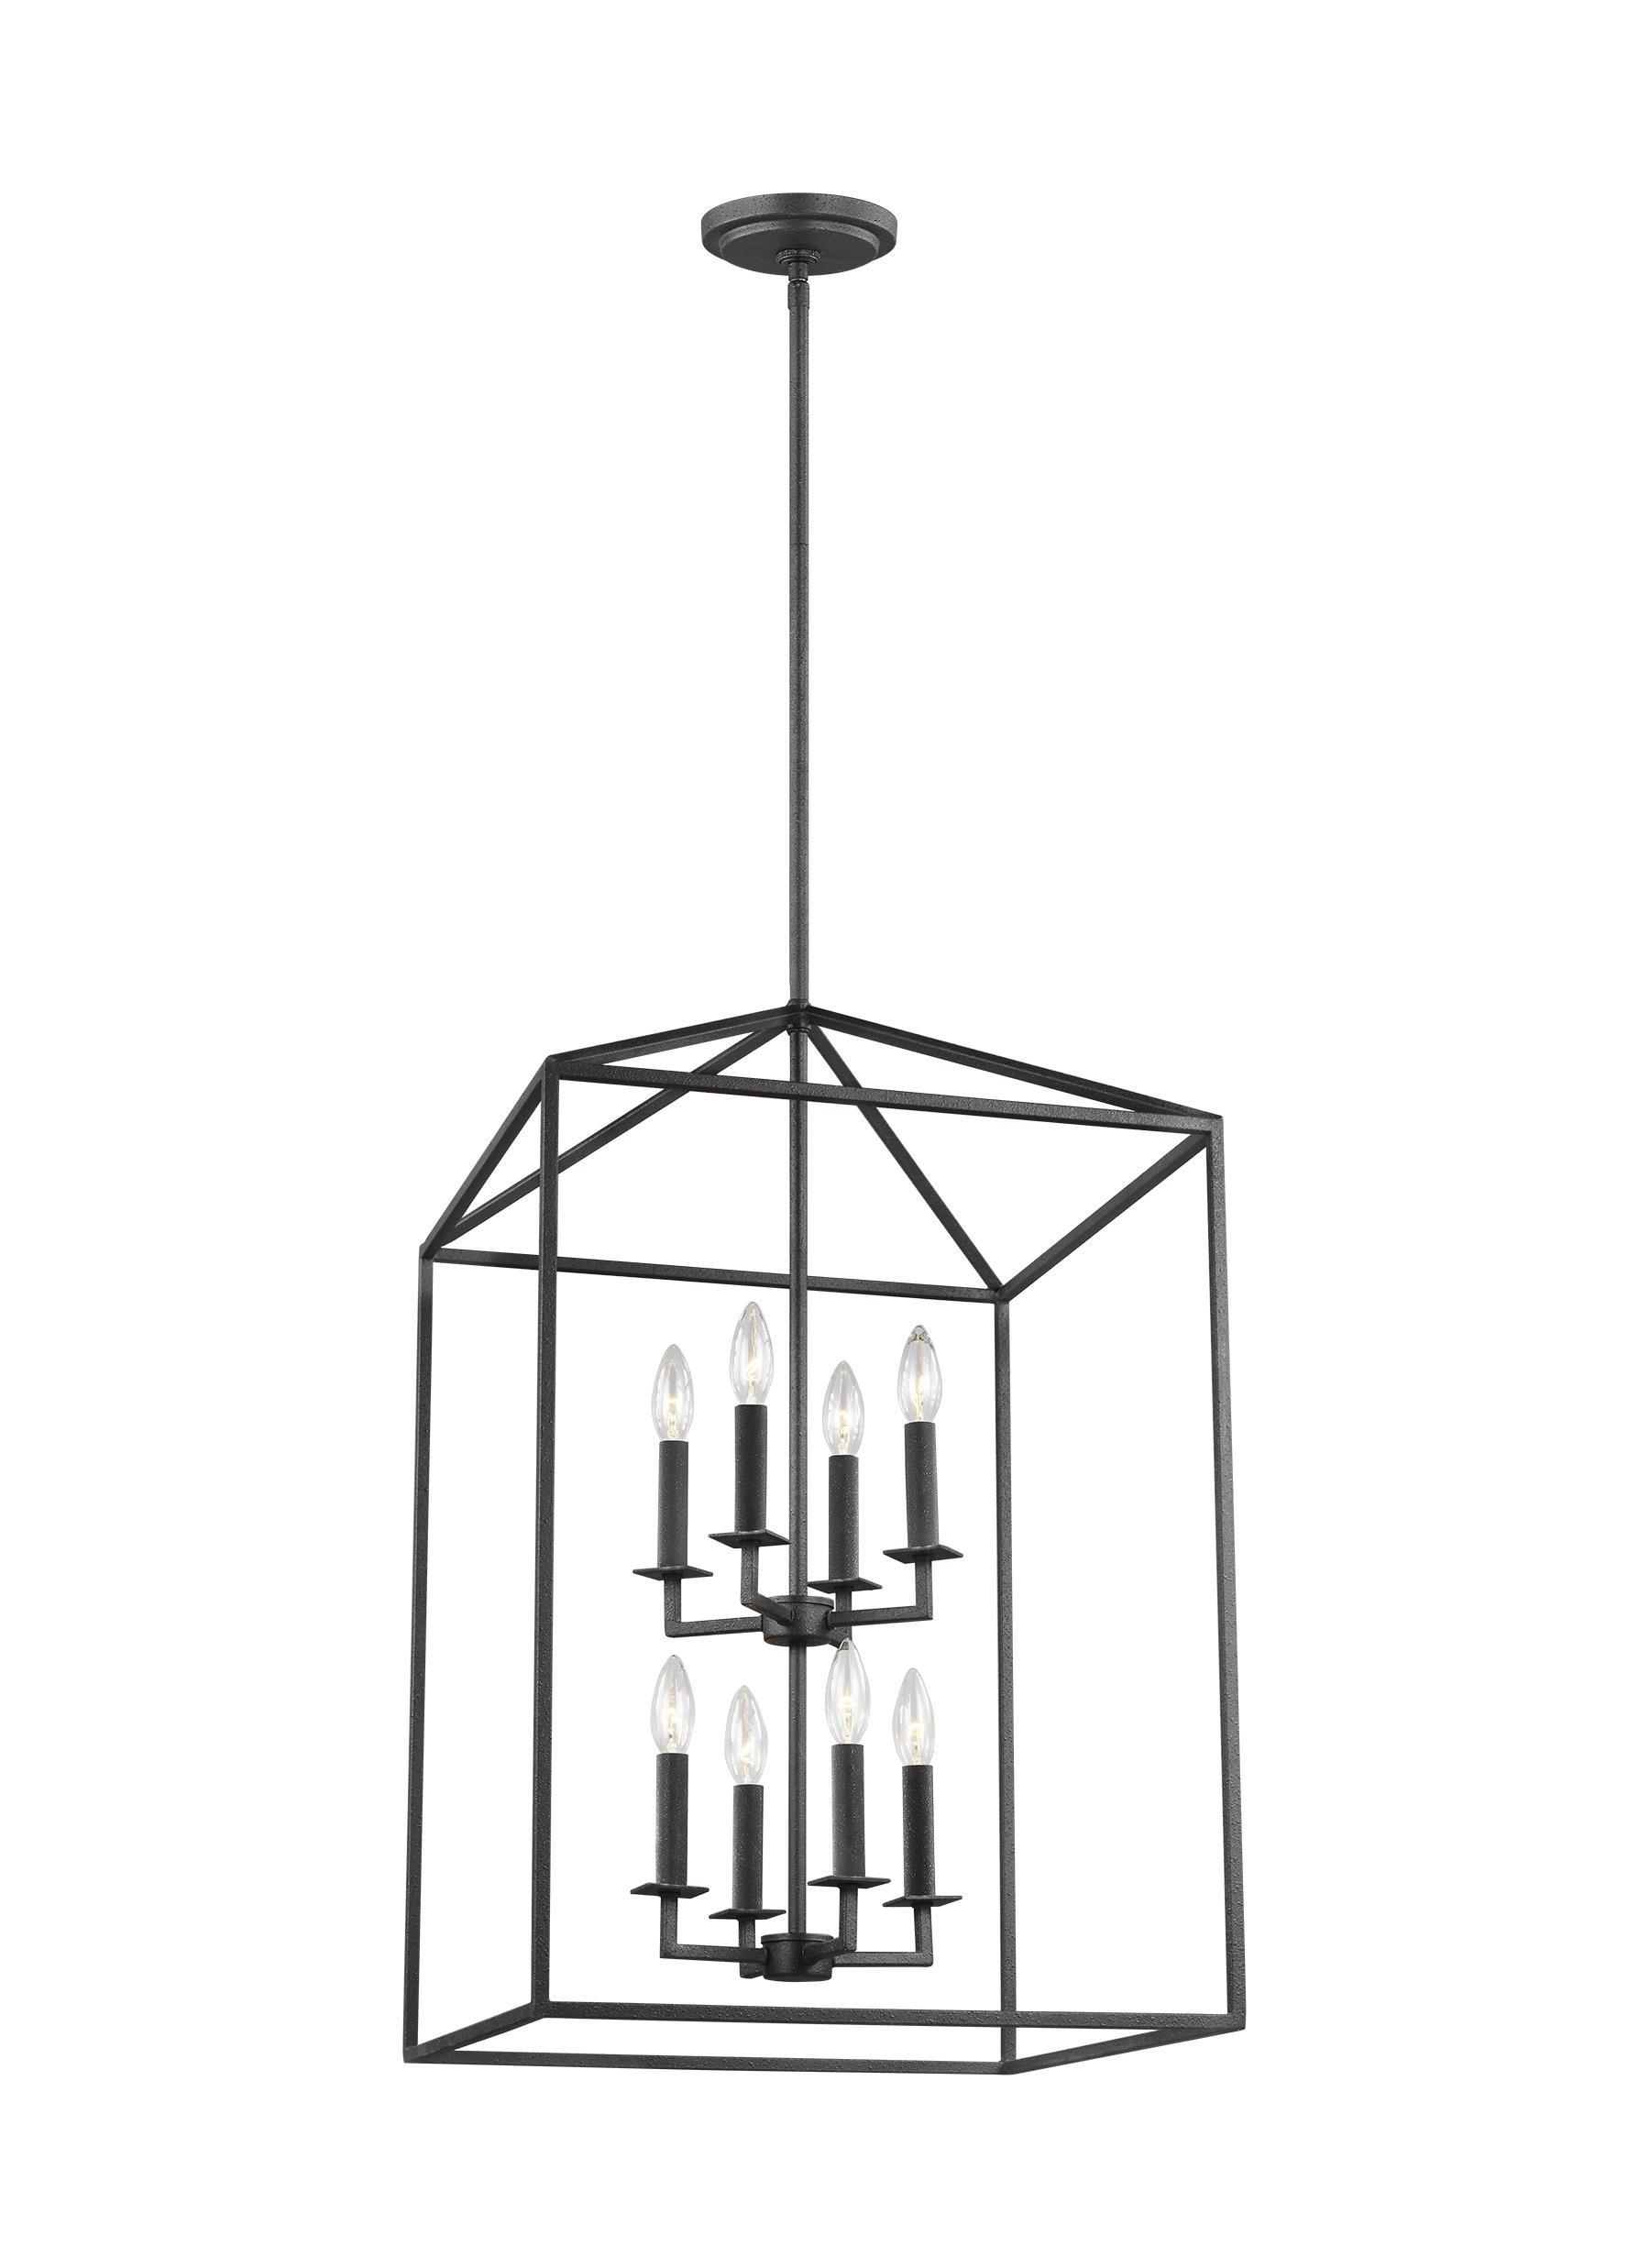 Odie 8-Light Lantern Square / Rectangle Pendant throughout Odie 4-Light Lantern Square Pendants (Image 21 of 30)